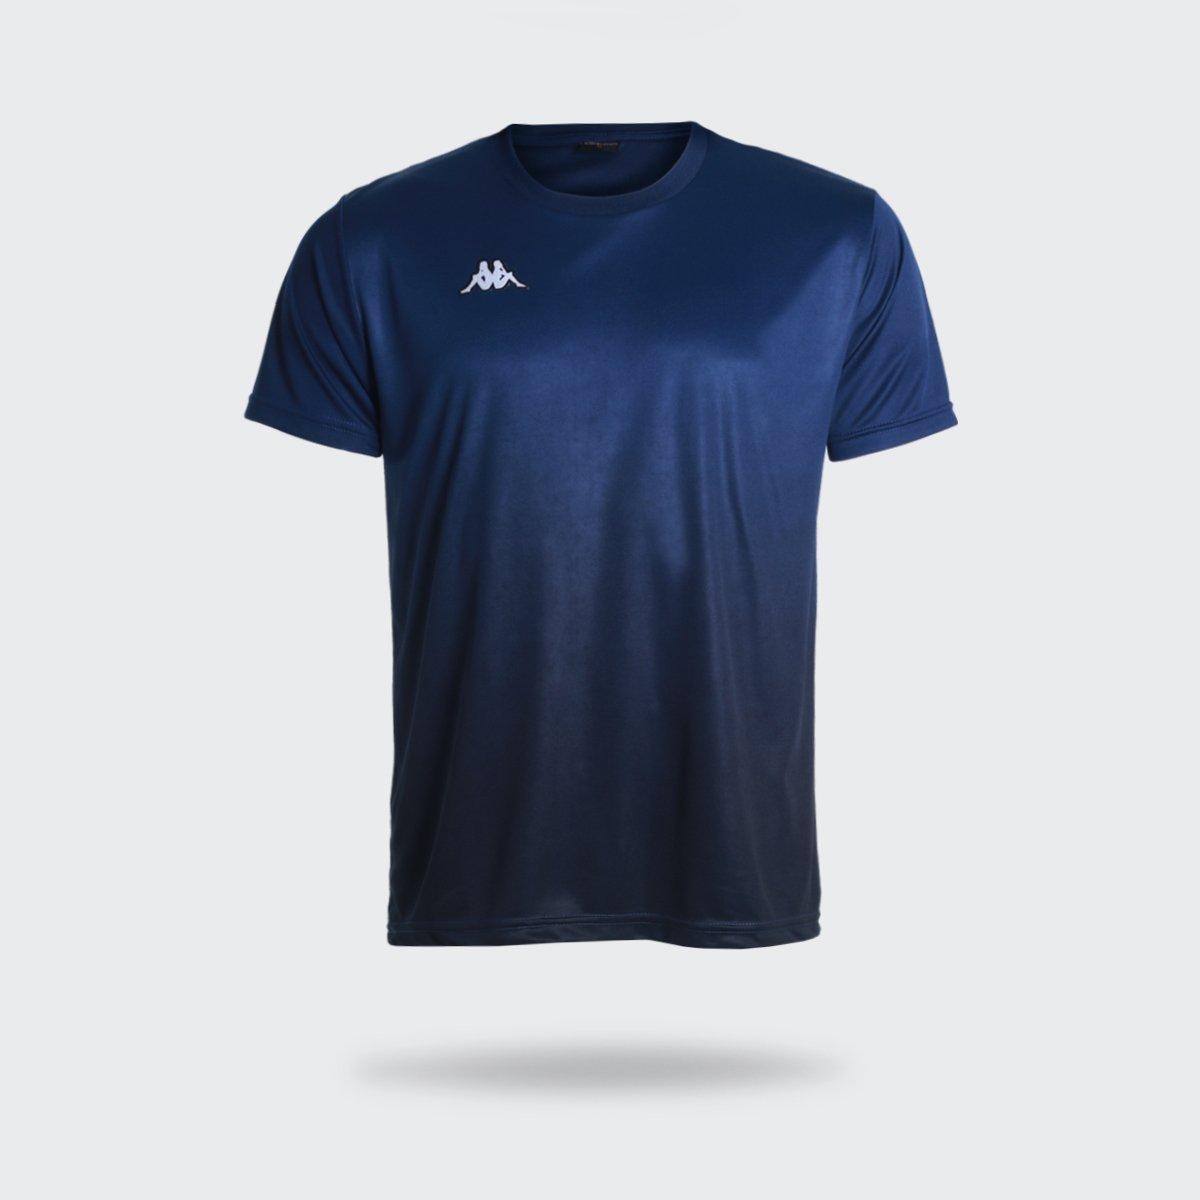 47acaf76ba Camisa Kappa Clair Masculina - Compre Agora